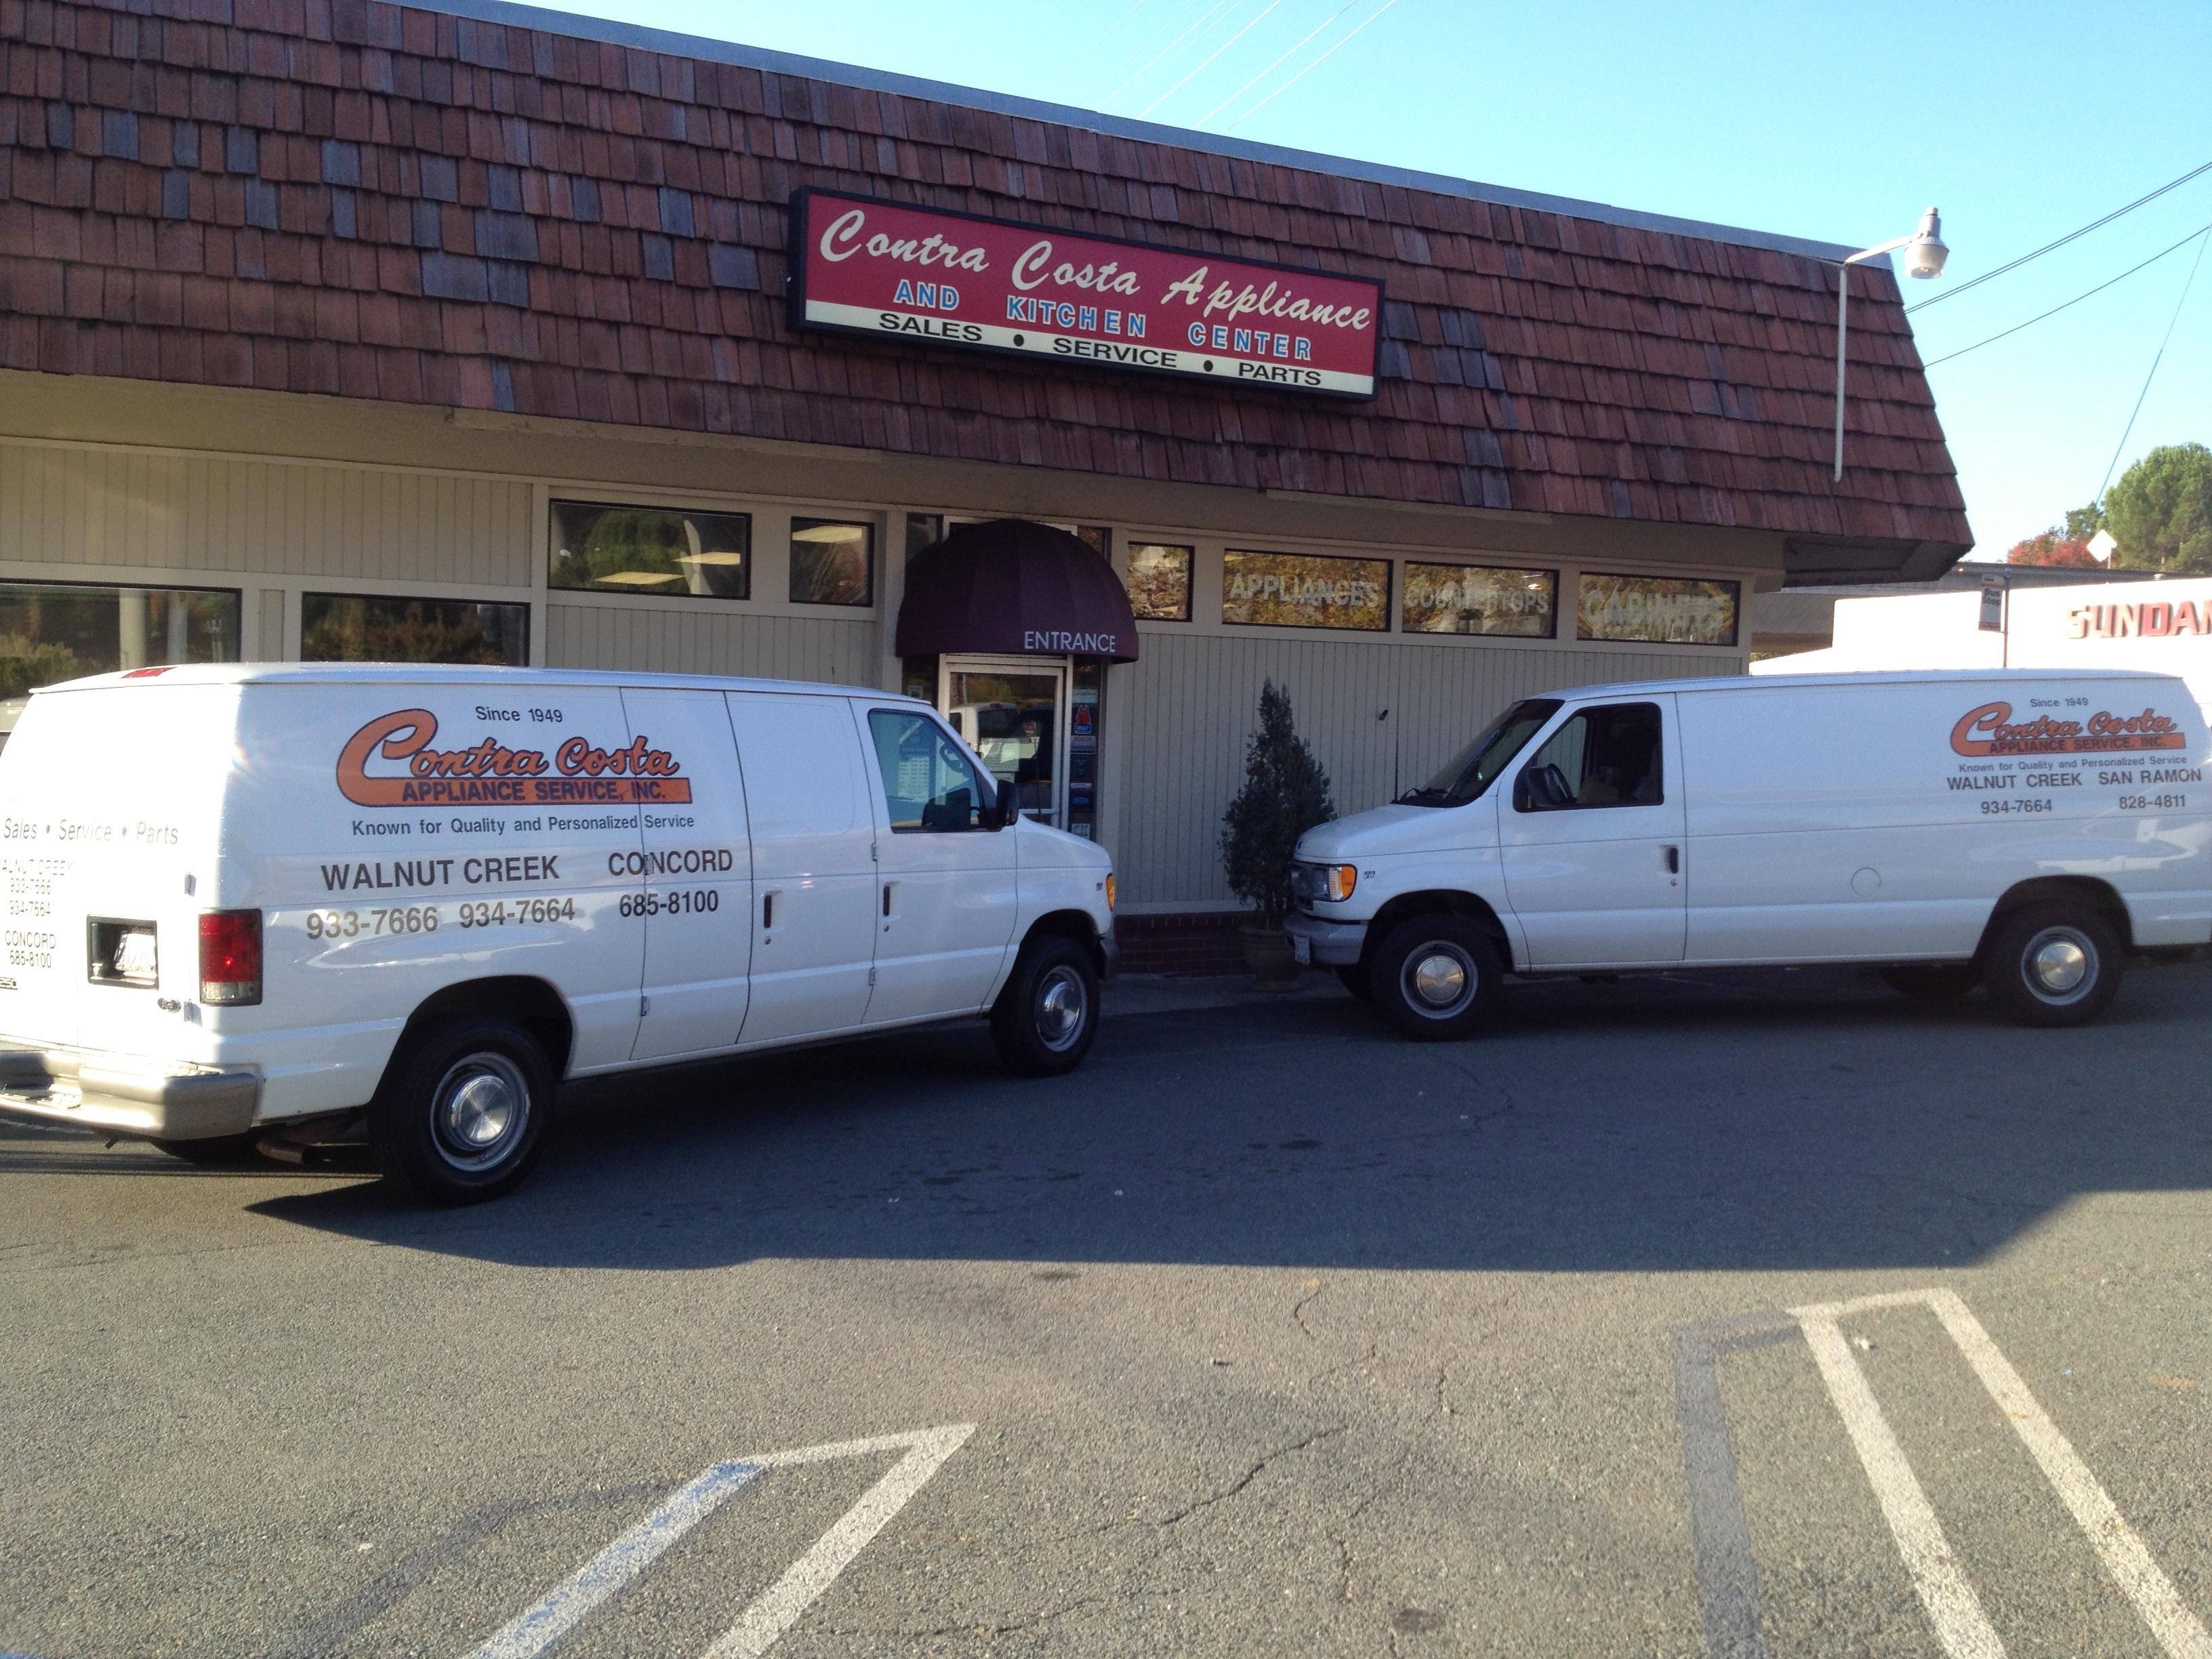 Uncategorized Contra Costa Appliance And Kitchen Center contra costa appliance service inc walnut creek ca 94595 yp com